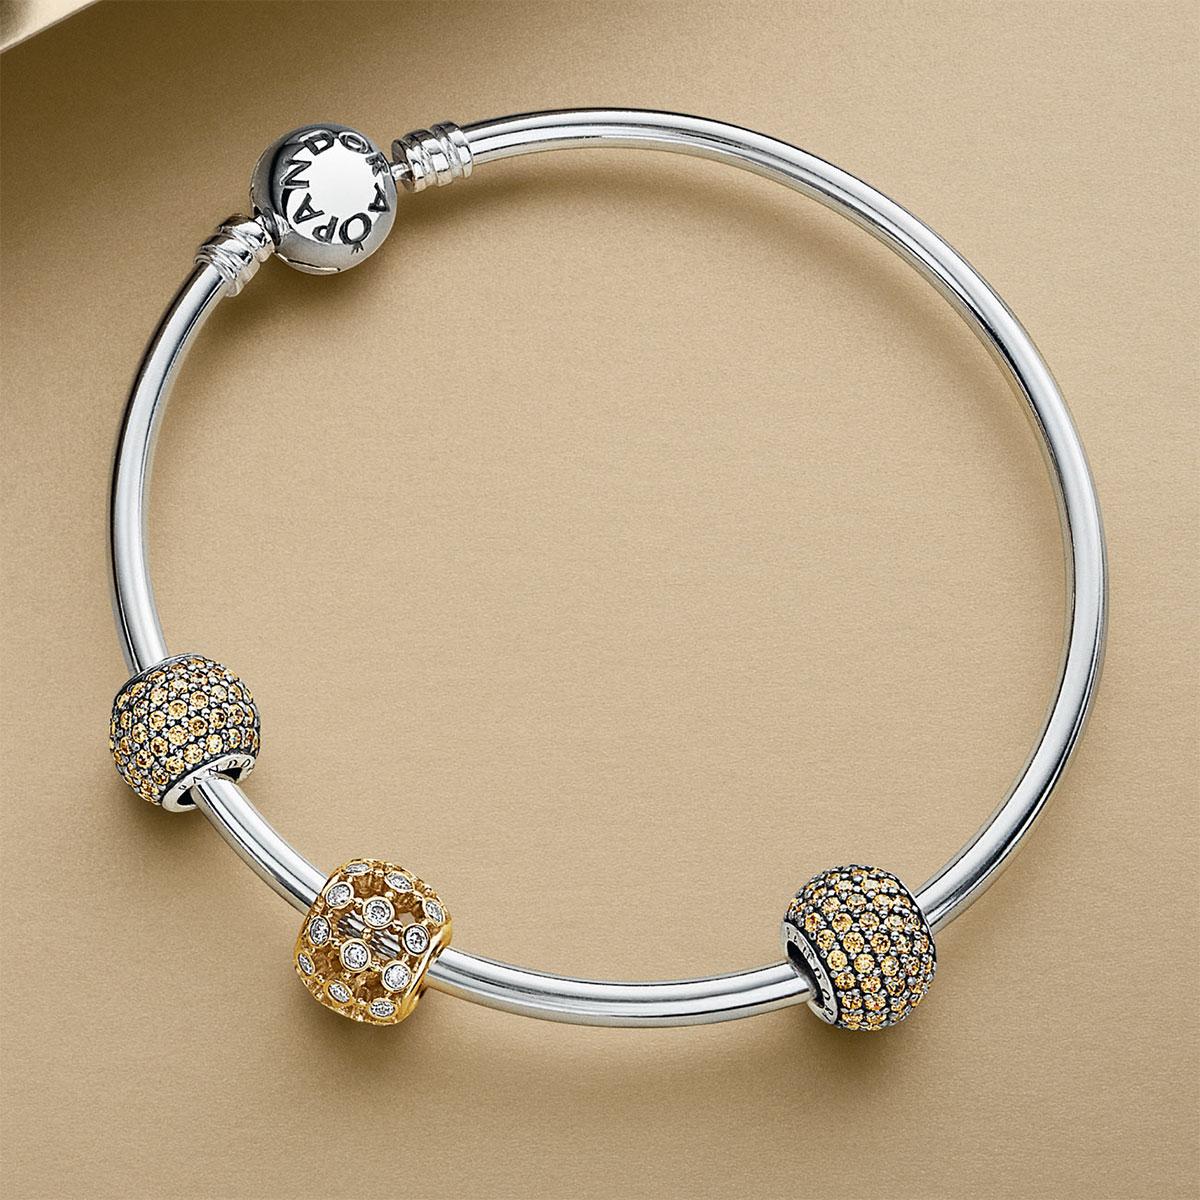 Pandora Sterling Silver With Barrel Clasp Bangle Bracelet 590713